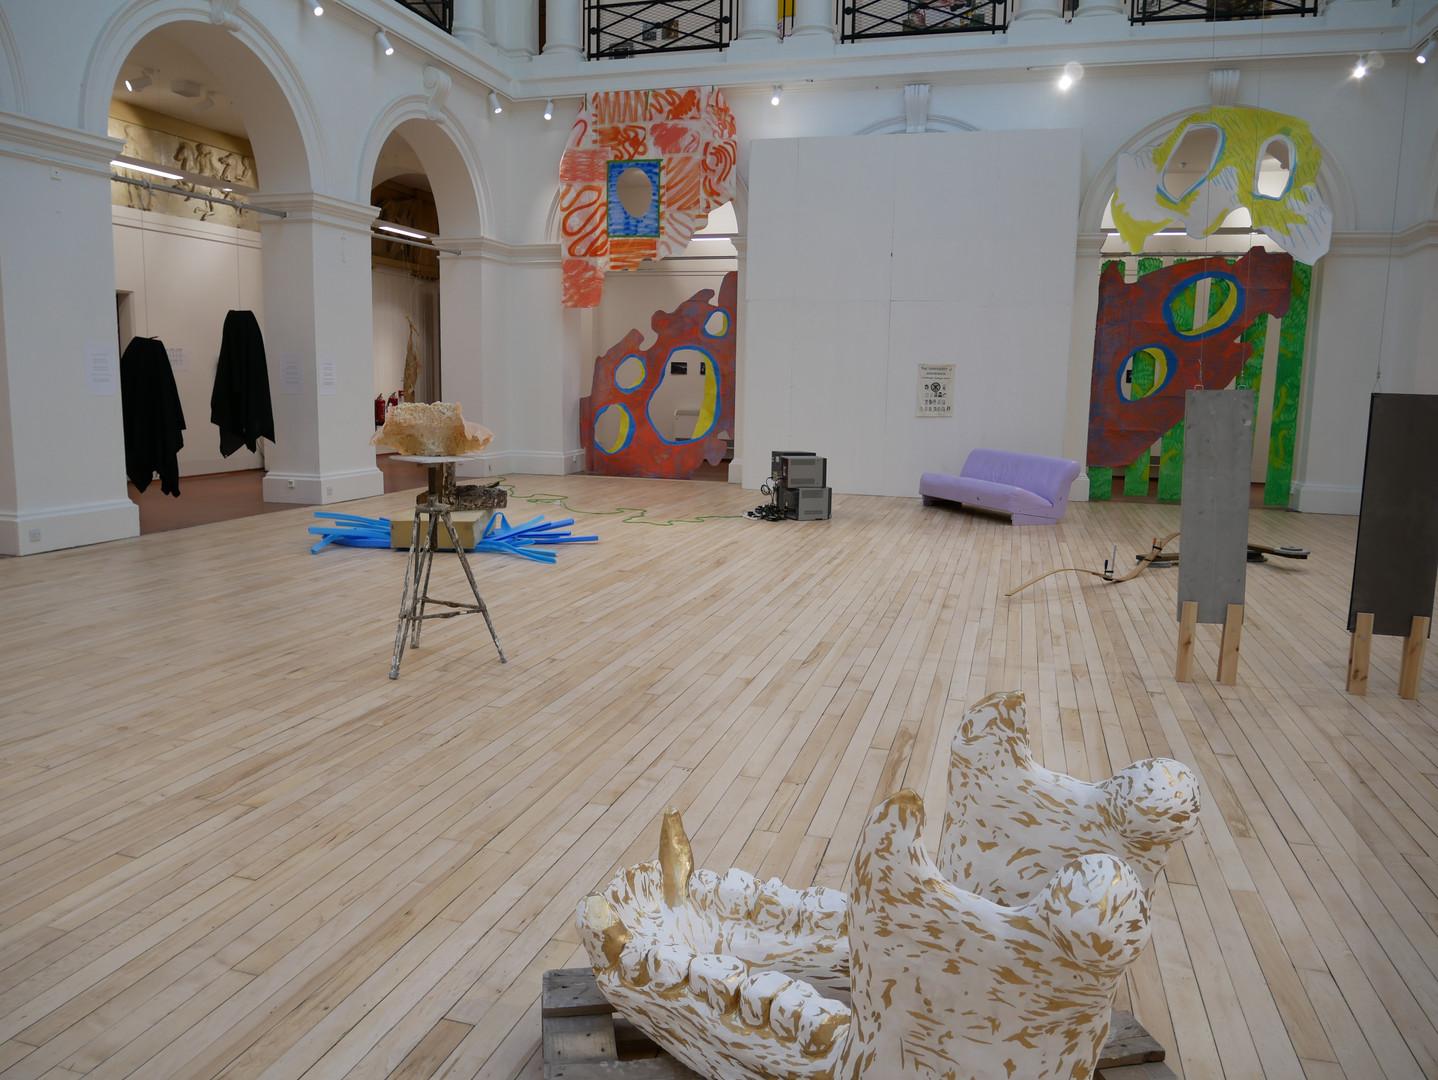 Safe Haven Settlement,2019. 5, 4, 3, 2, 1. Edinburgh College of Art.